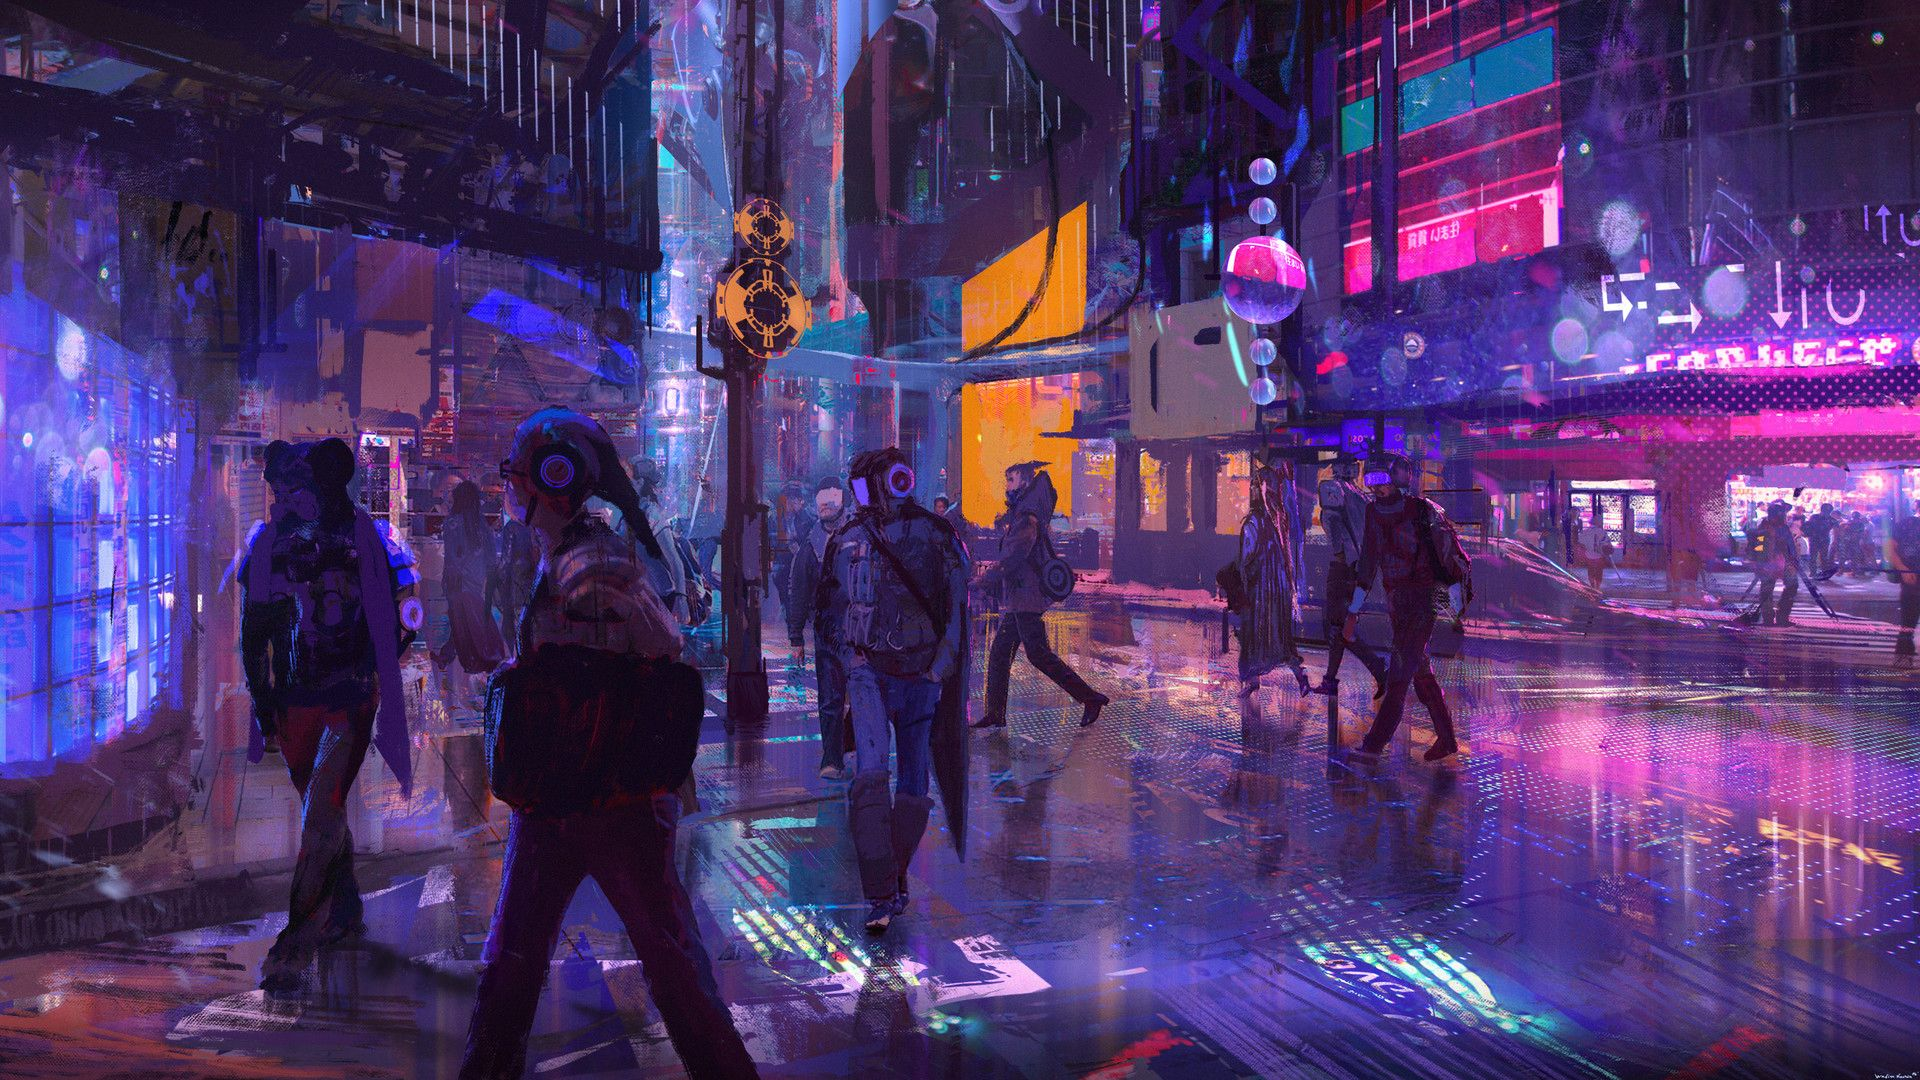 cyberpunk city hd wallpapers - photo #28